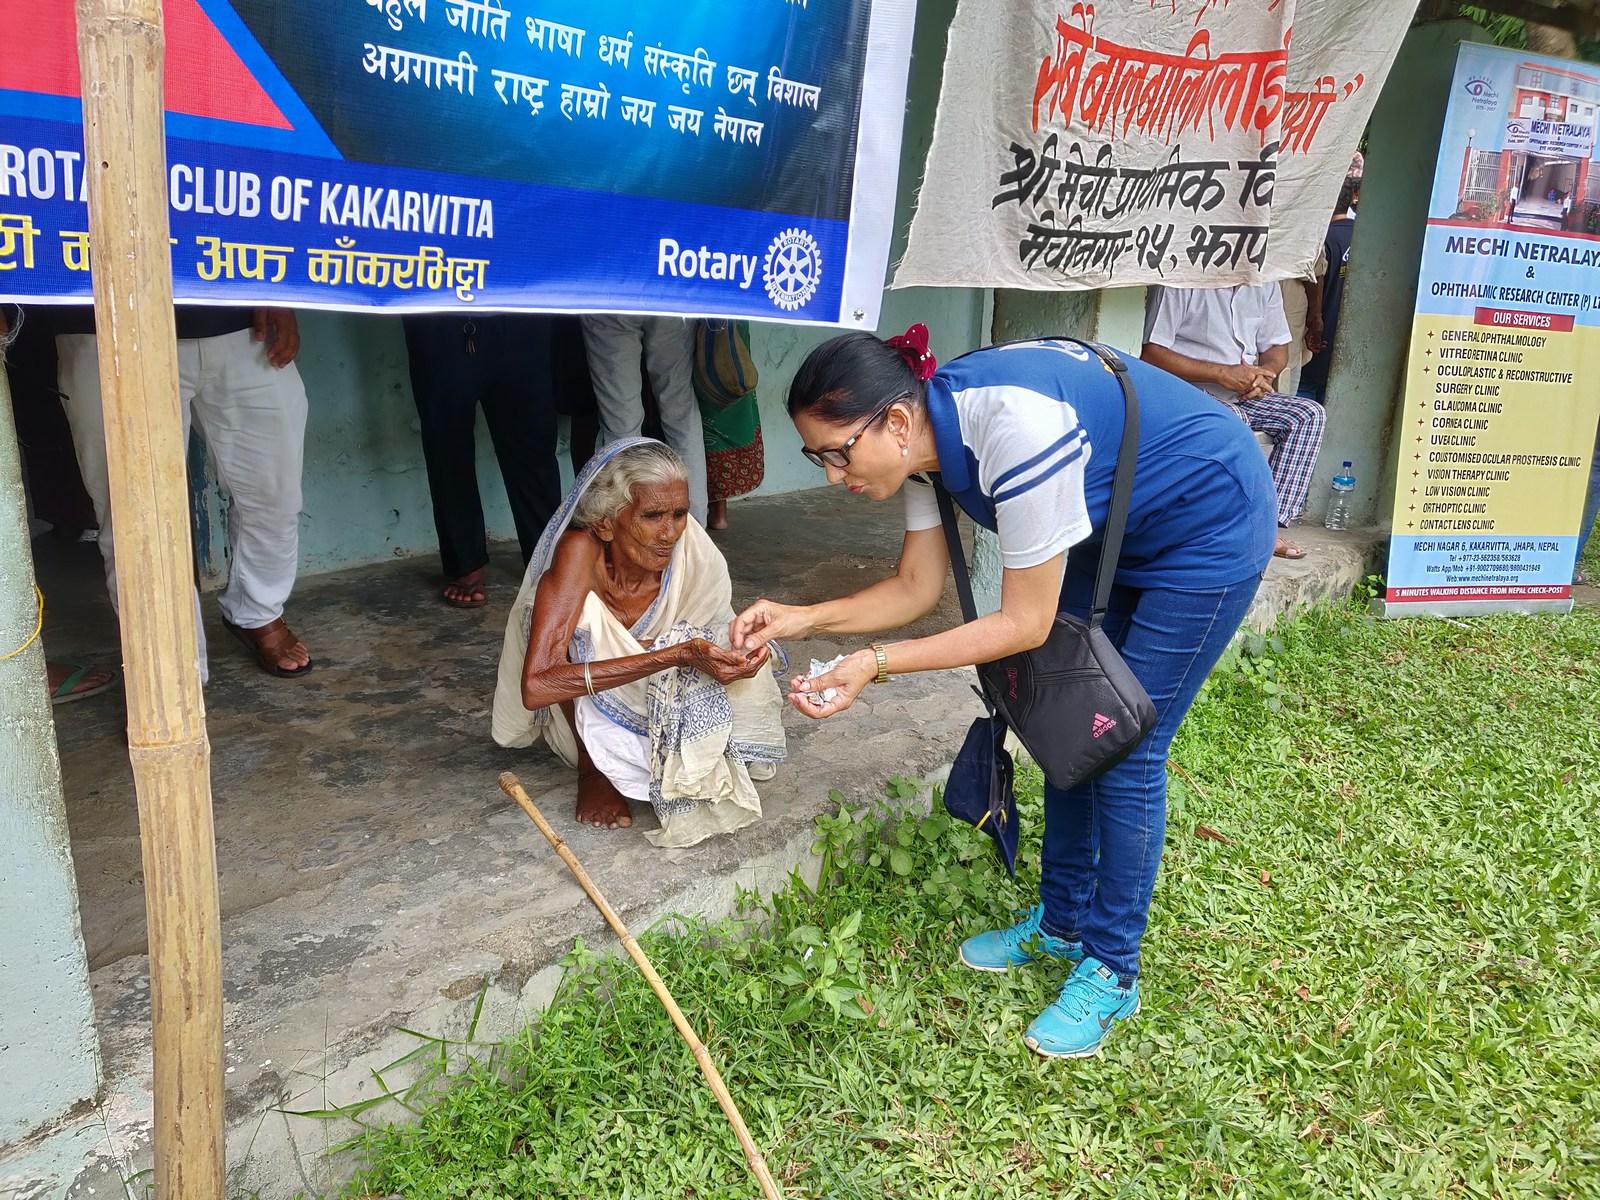 Free-Health-Camp-Eye-Screening-at-Gwala-Basti-Mechinagar-15-Jhapa-Nepal-Rotary-Club-of-Kakarvitta-20